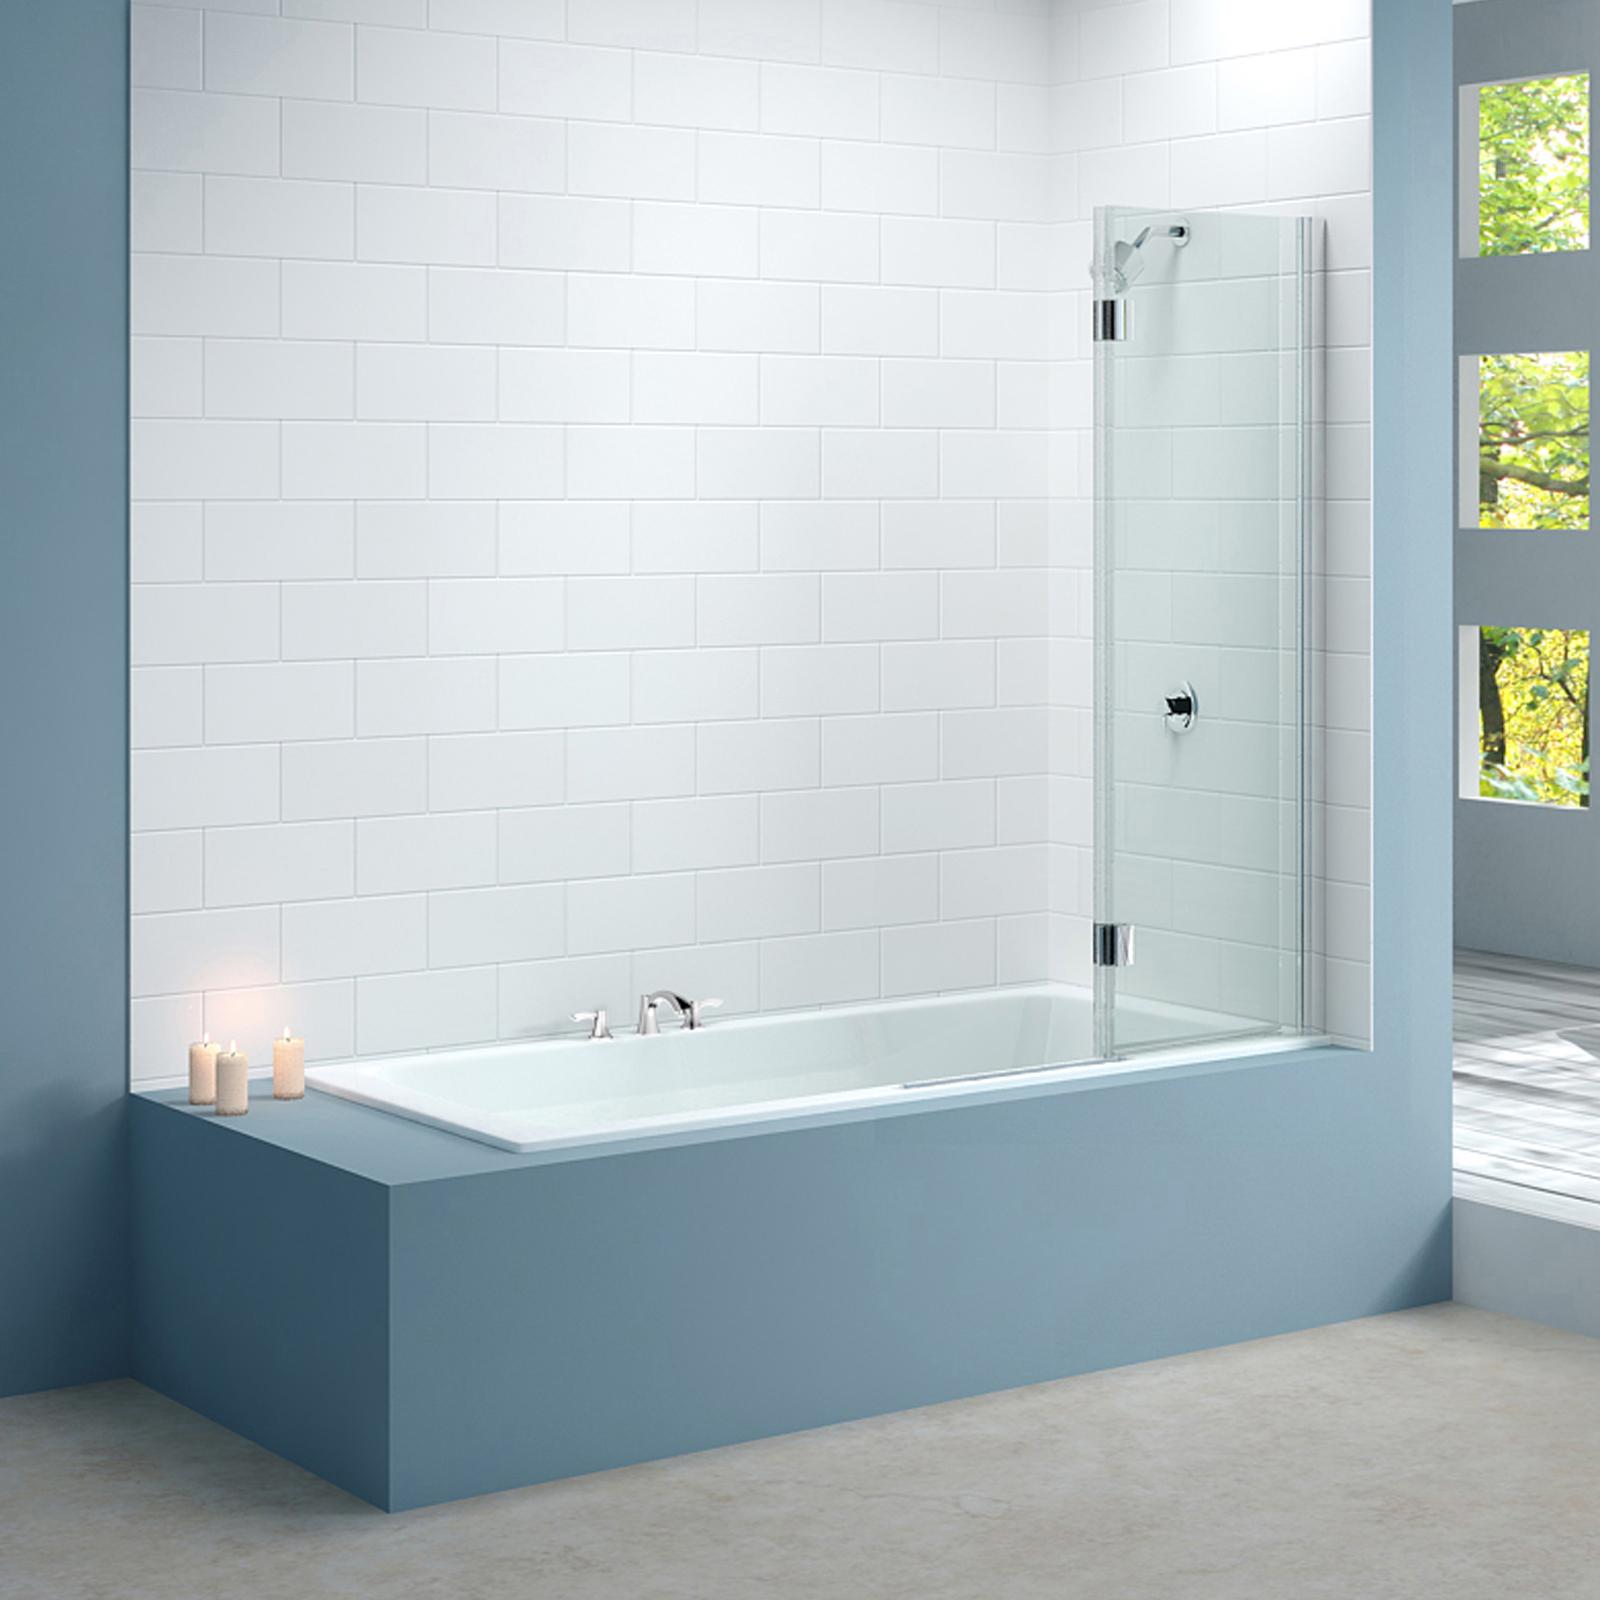 Merlyn secureseal bath screen diy planer stand